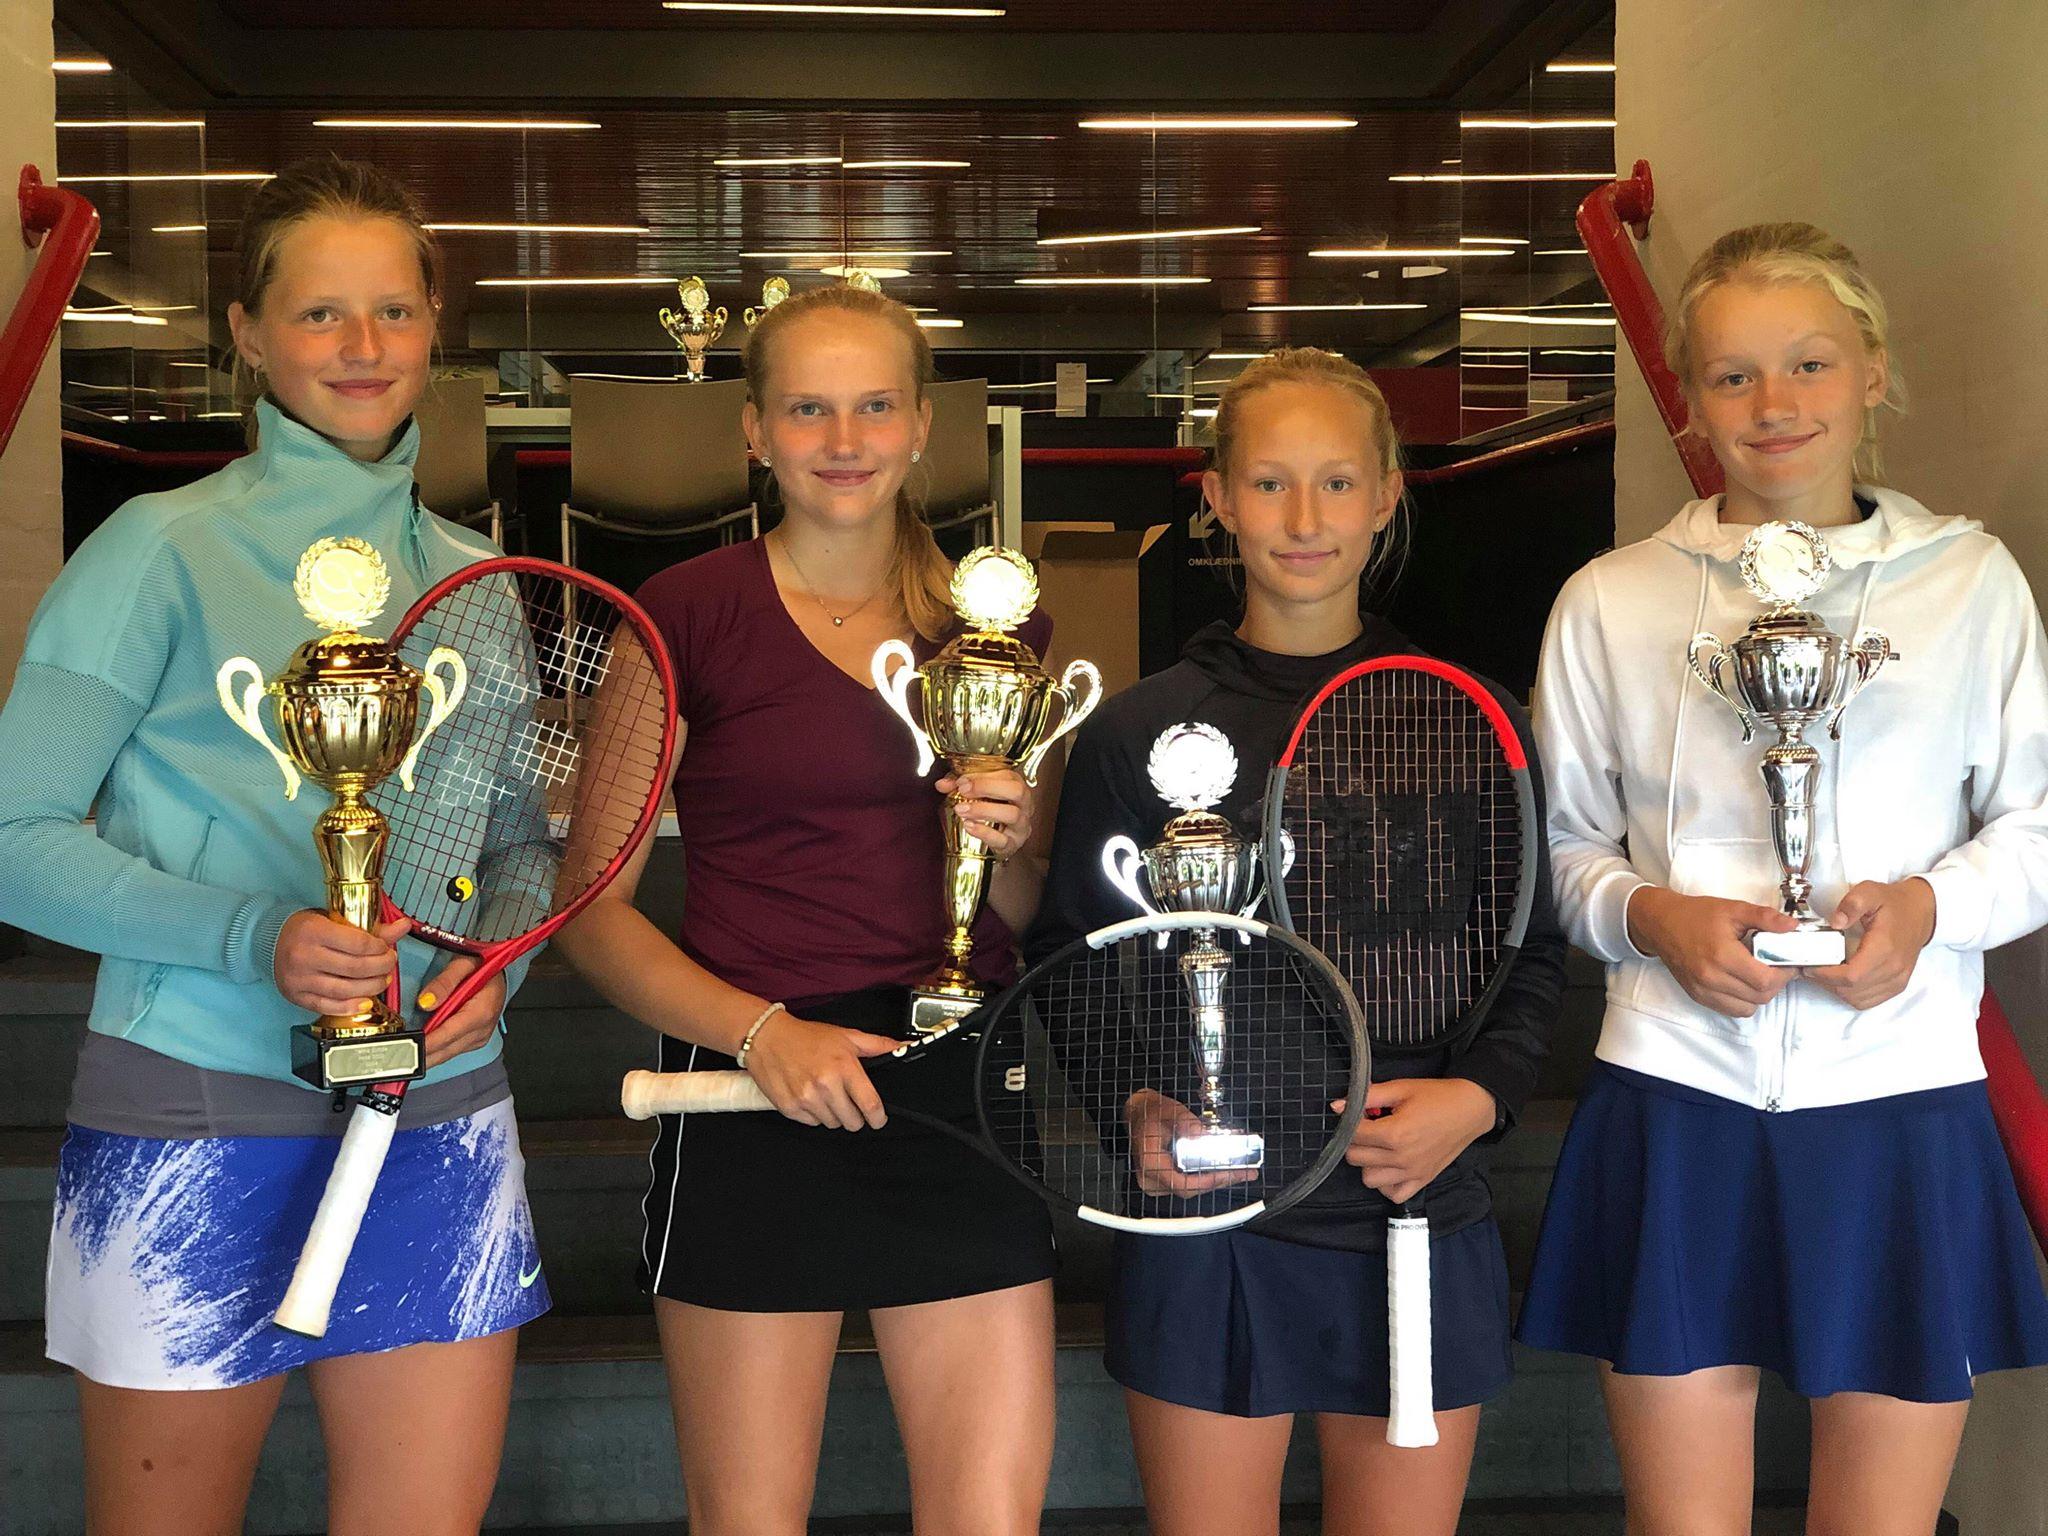 Zoe Du Pasquier Jensen, Emma Lindh og Laura Brunkel, Frederikke Alberte Pape